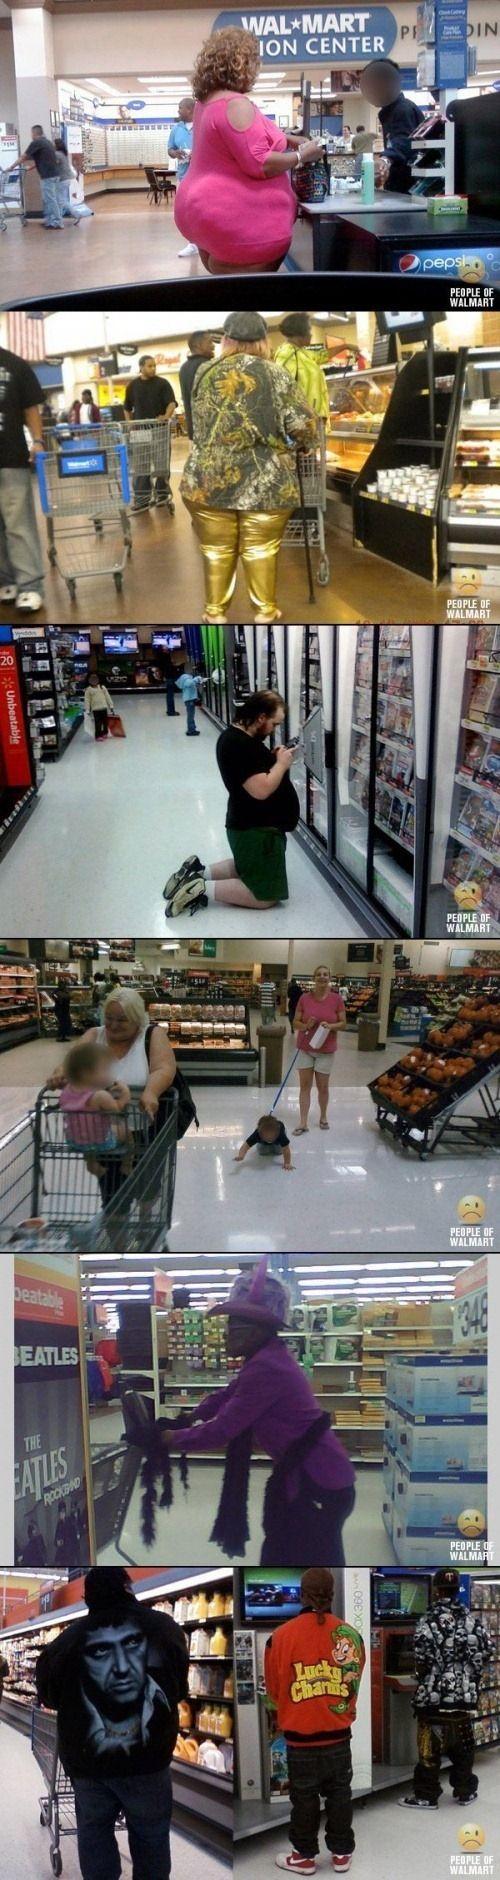 #Walmart's Best - Just DWL || The Ultimate Trolling